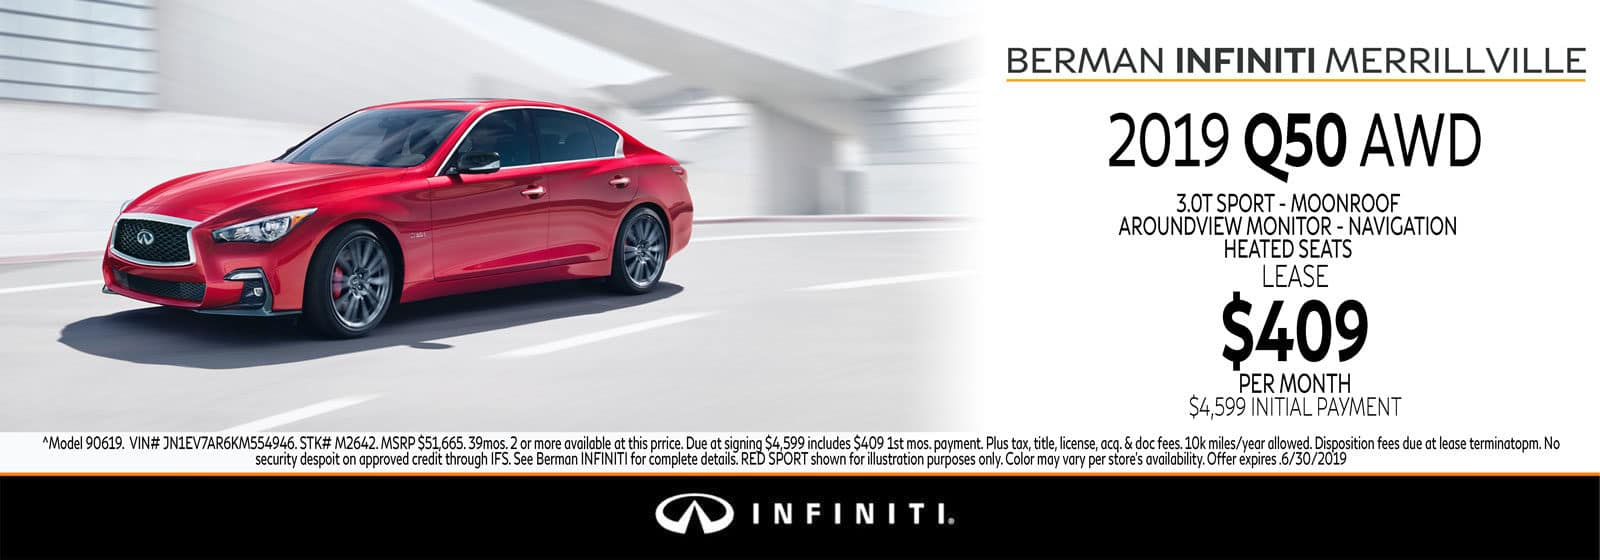 New 2019 INFINITI Q50 June Offer at Berman INFINITI of Merrillville!